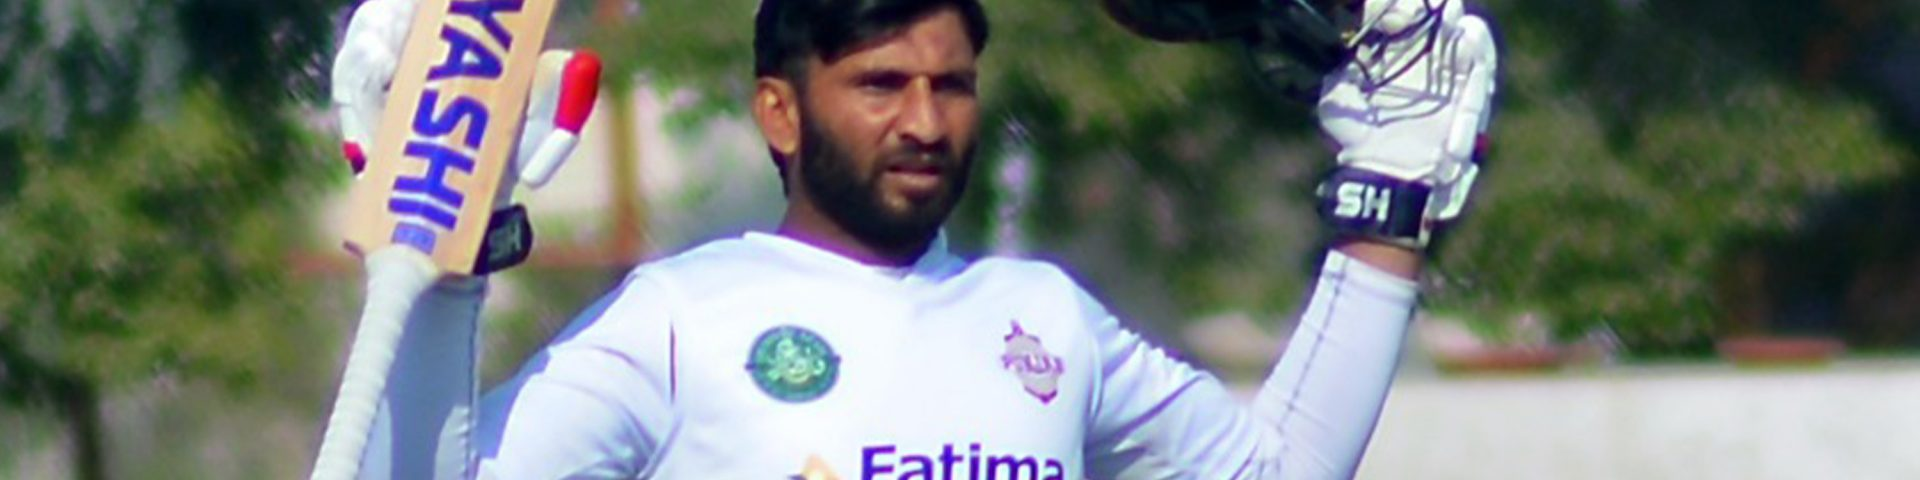 Mohammad Imran am 1920x480